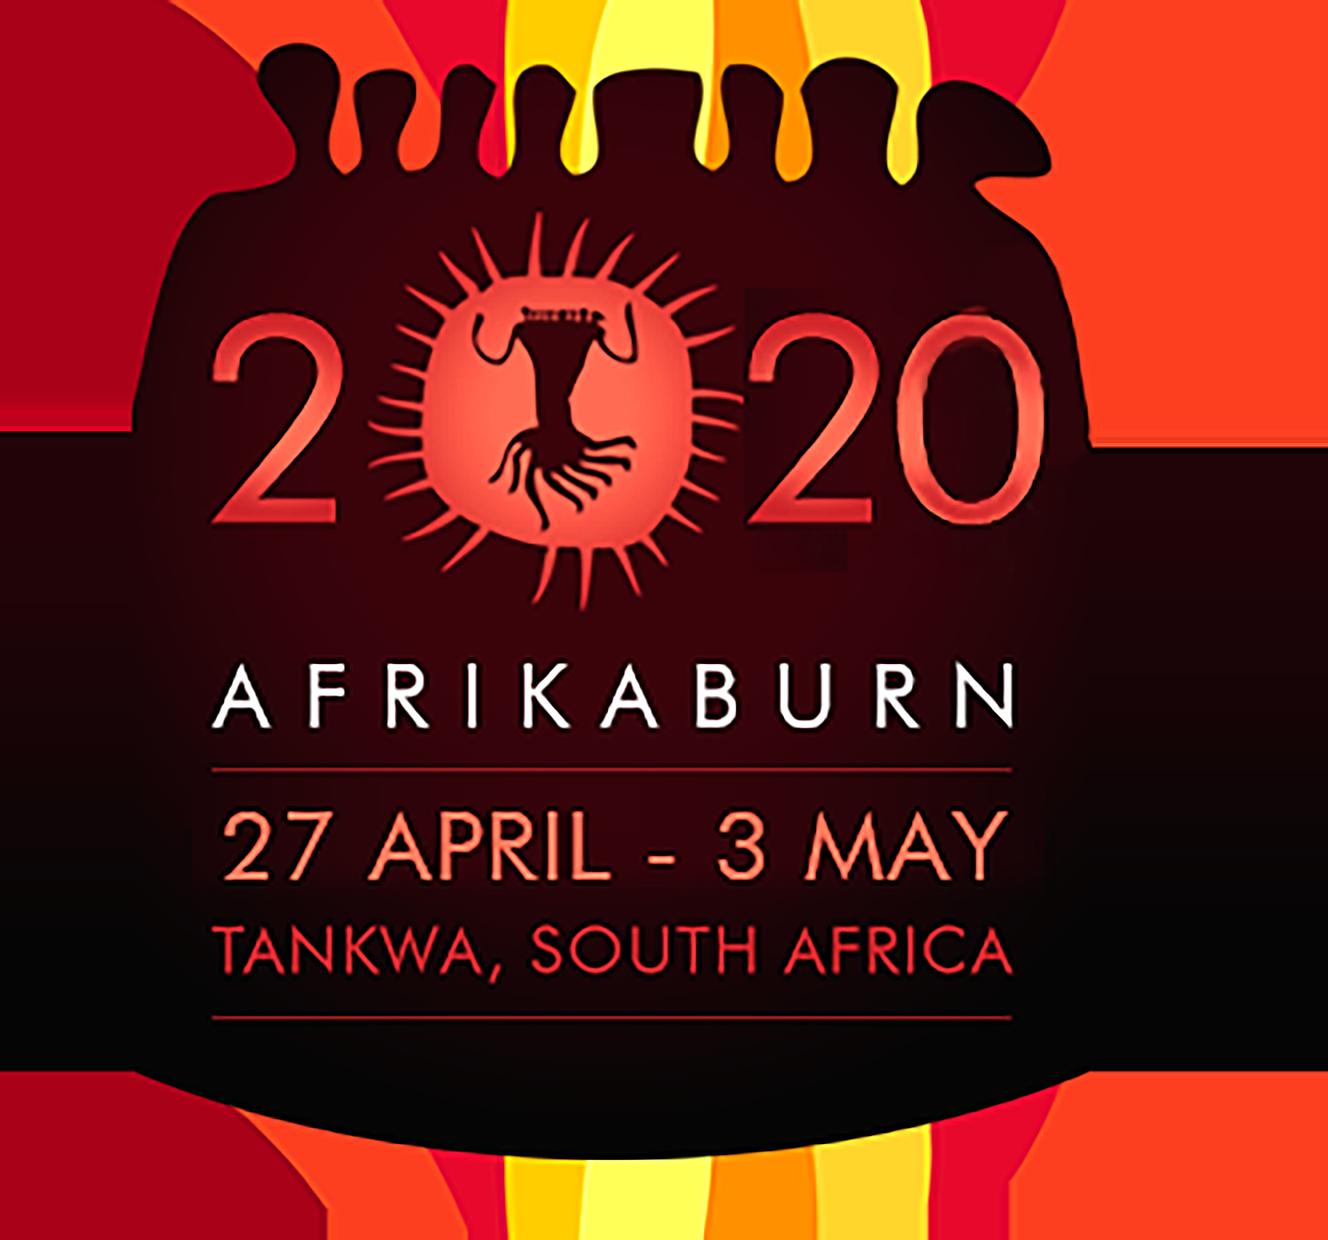 Afrika Burn 2020